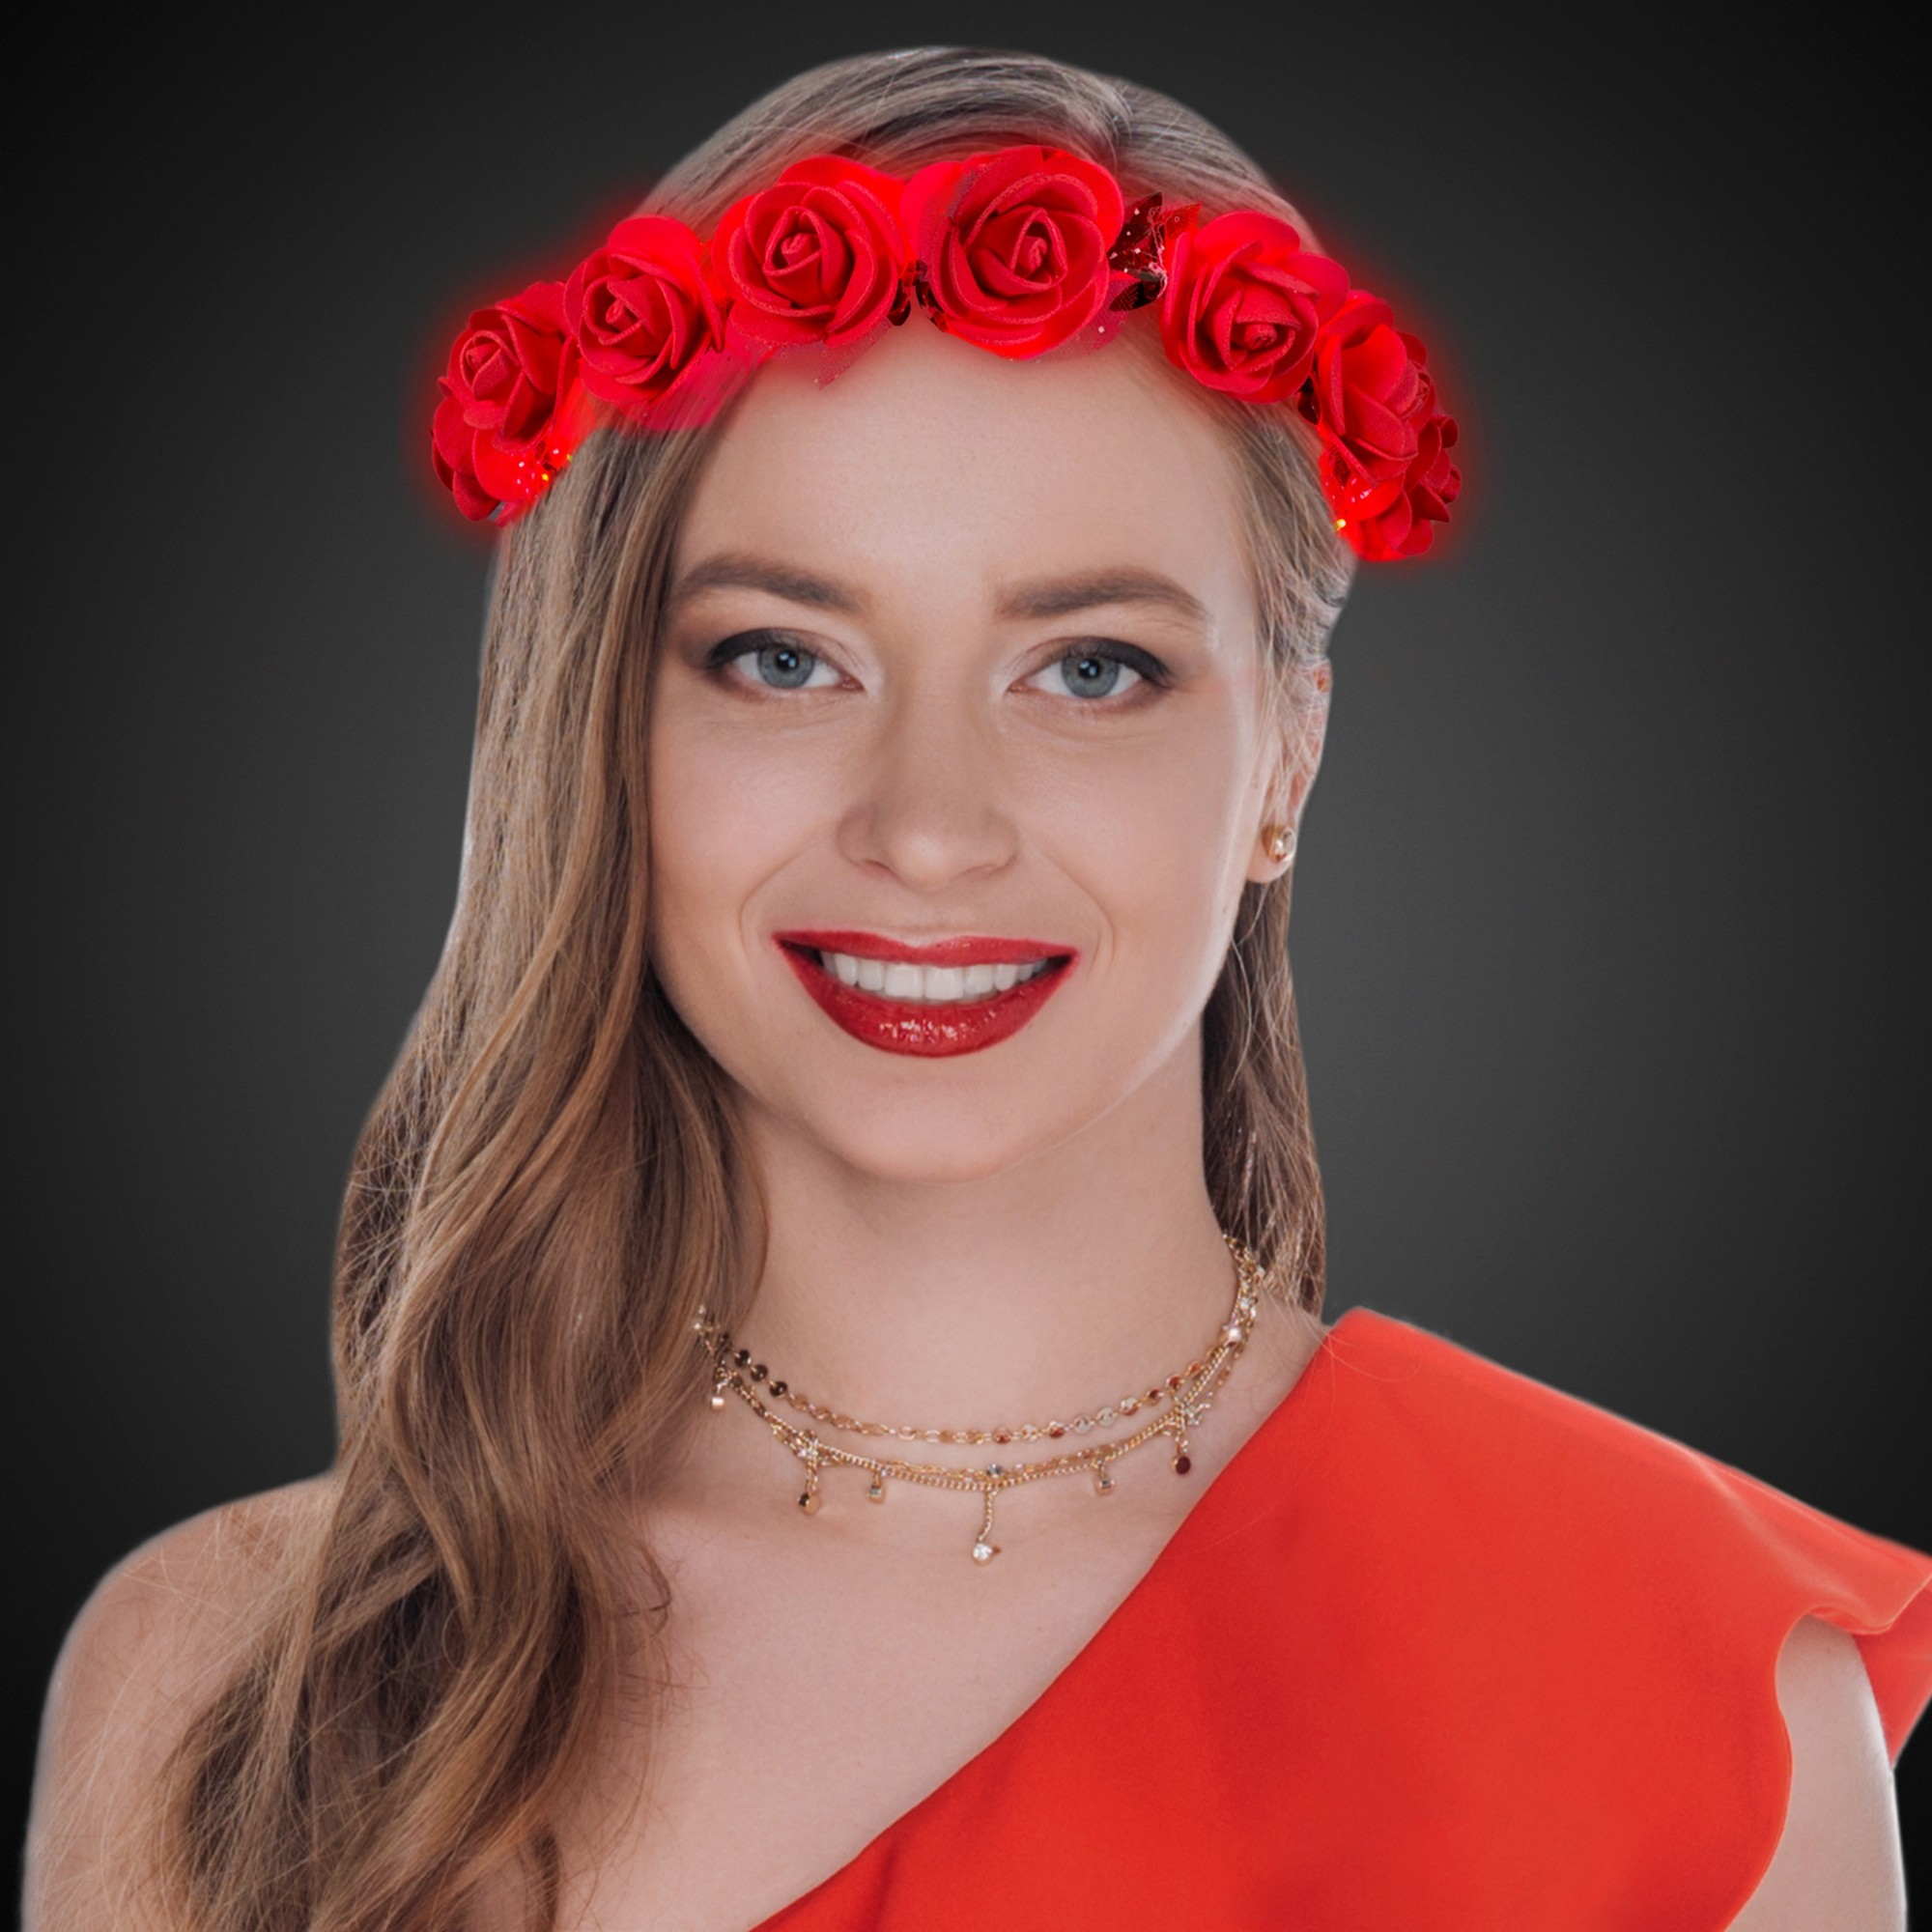 Red Roses LED Halo Headband